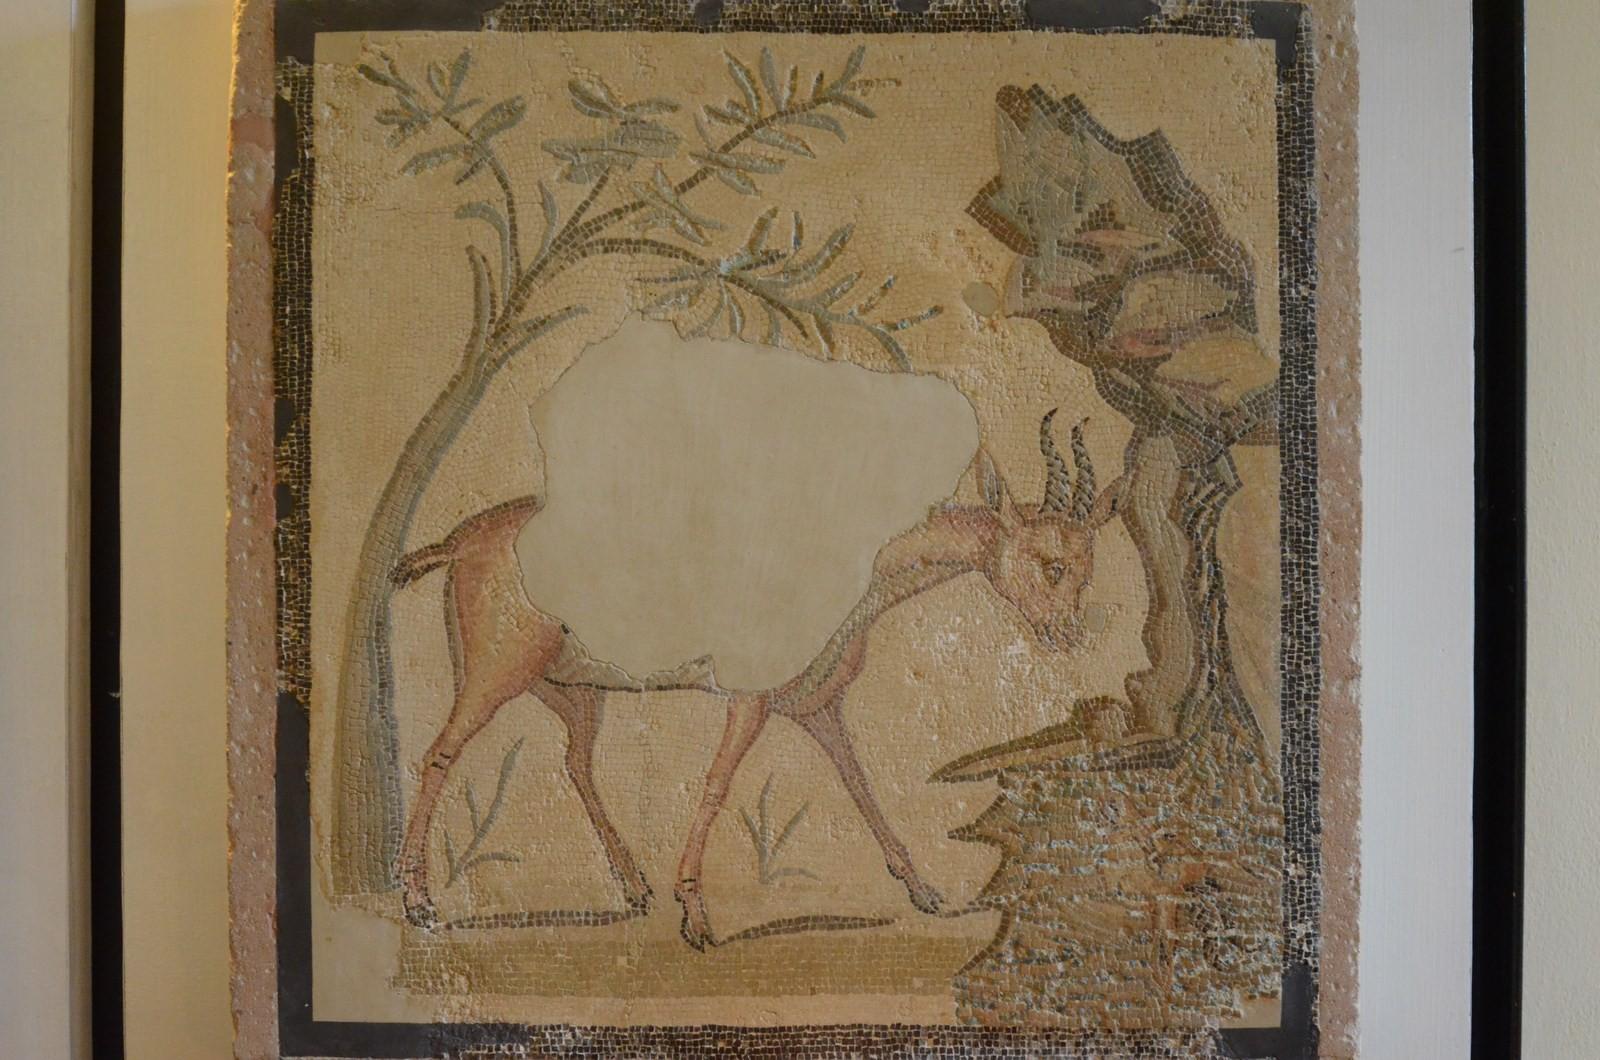 Agrigento, Archäologisches Museum, Mosaik